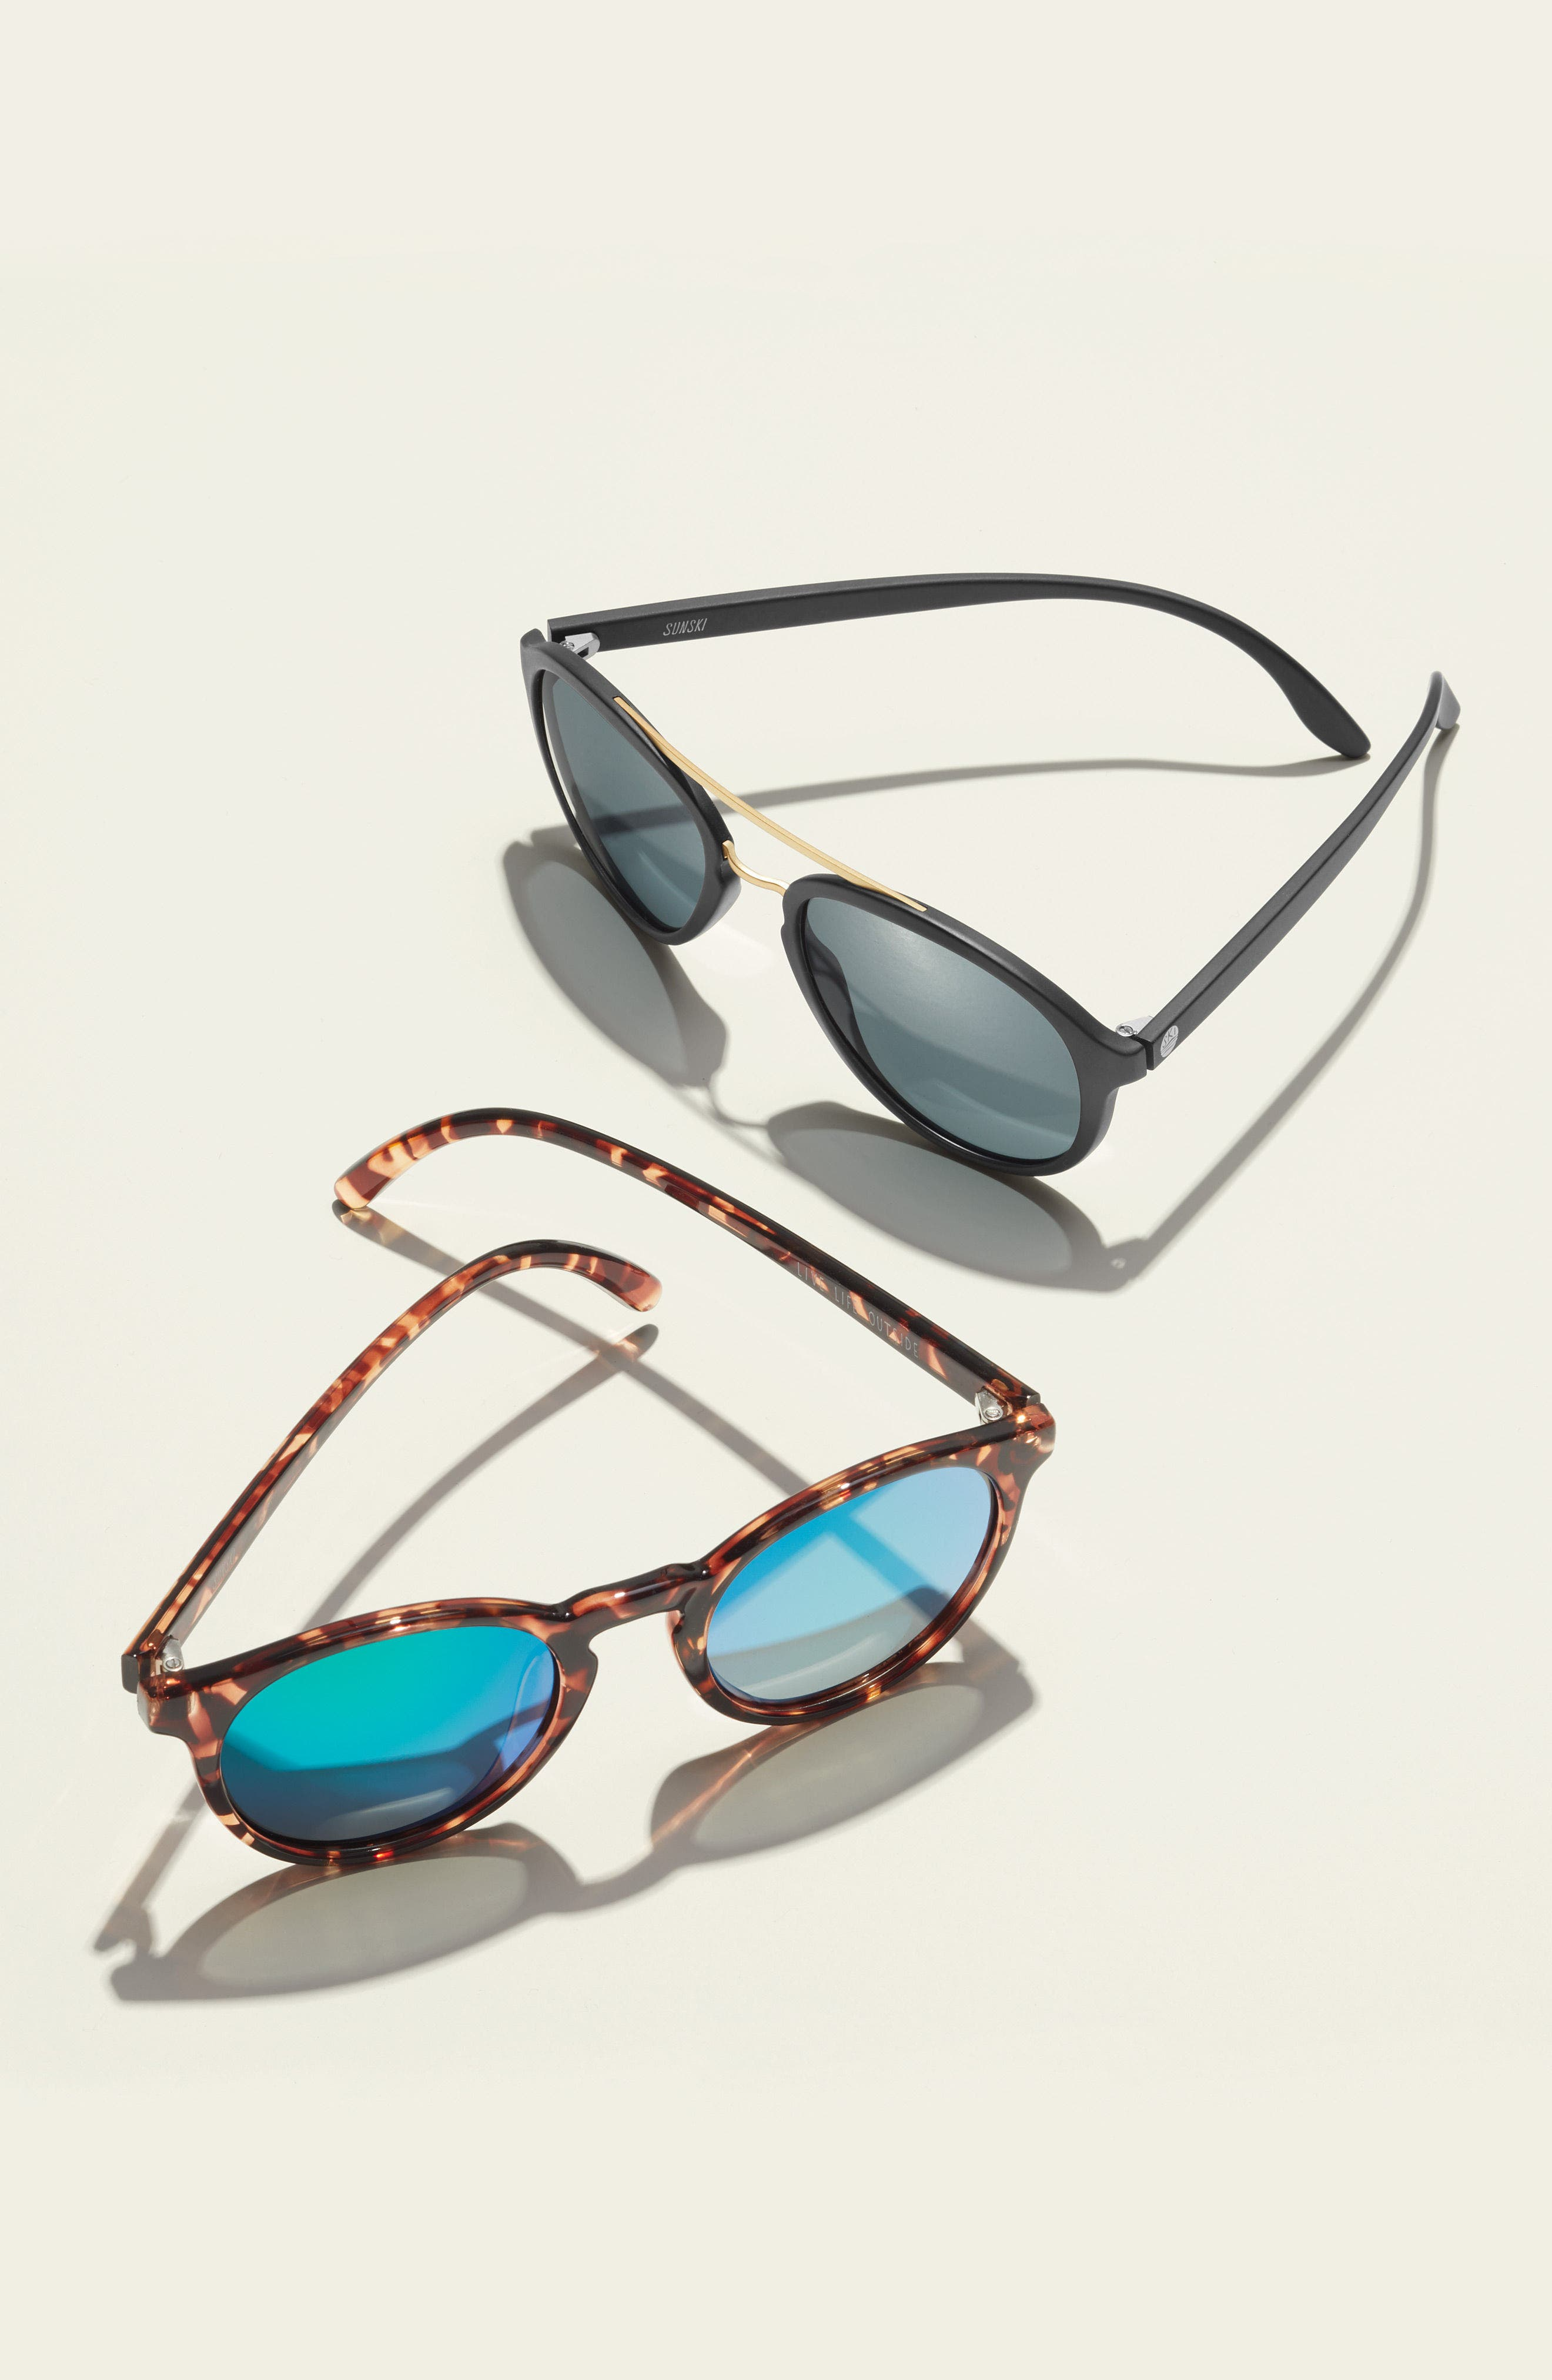 Dipsea 48mm Polarized Sunglasses,                             Alternate thumbnail 5, color,